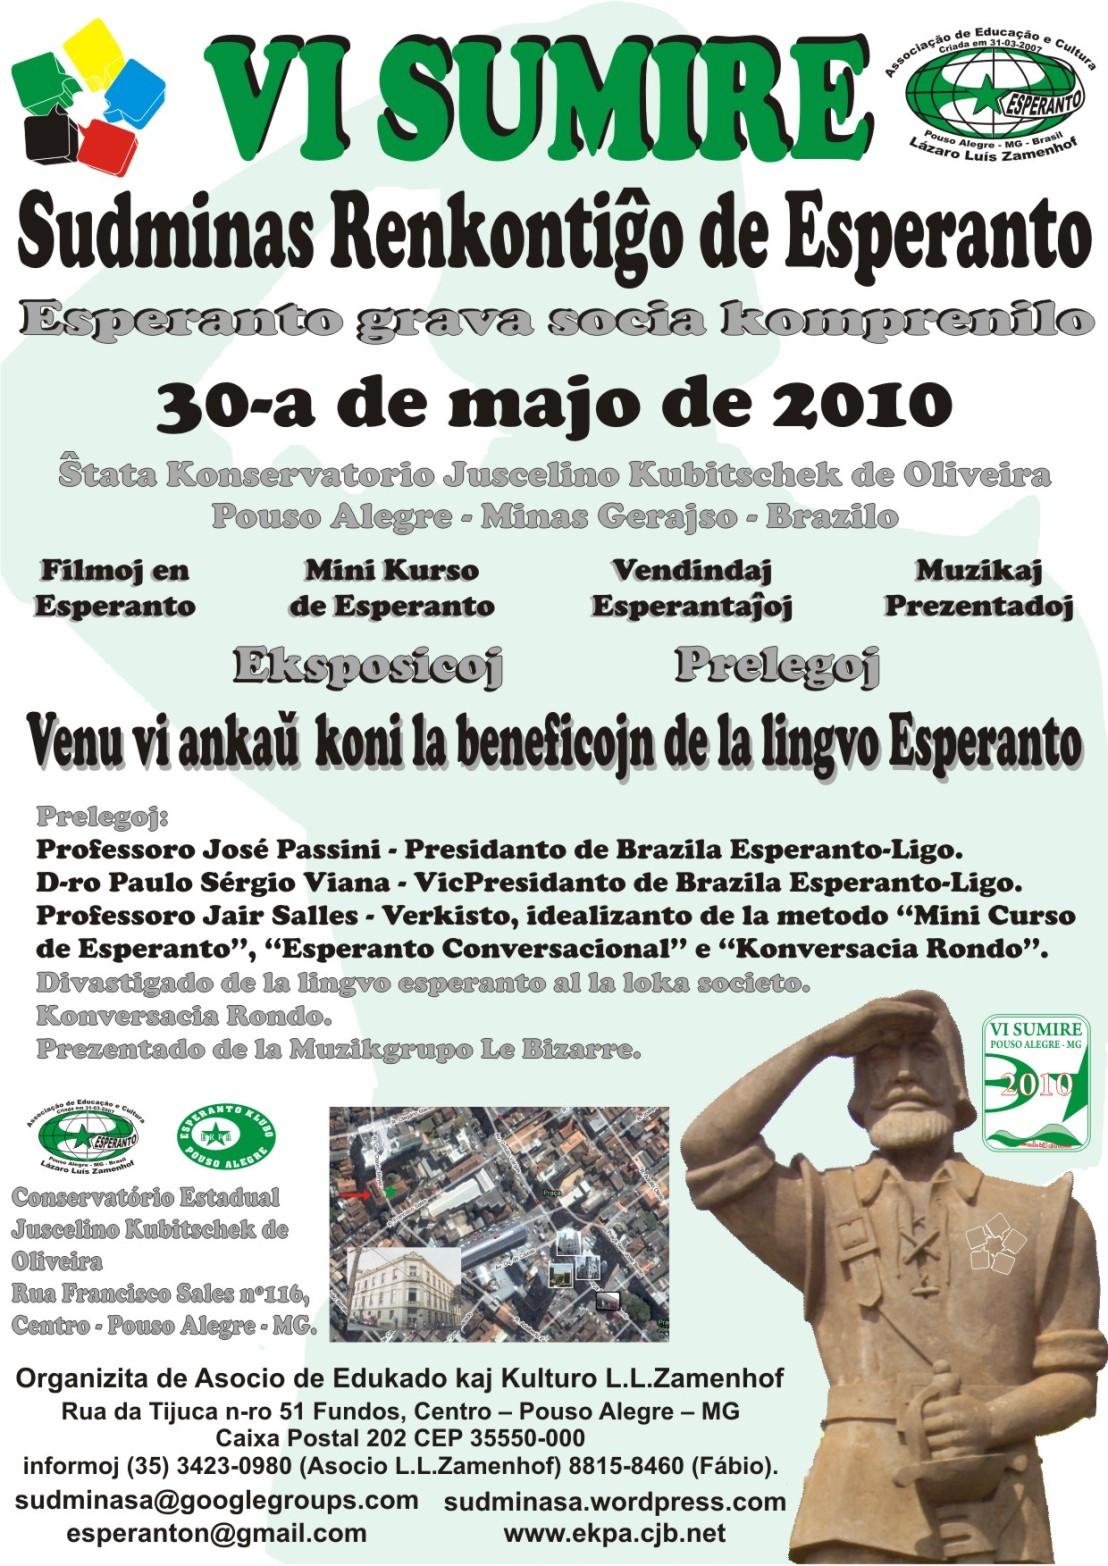 propaganda_sumire_esperanto